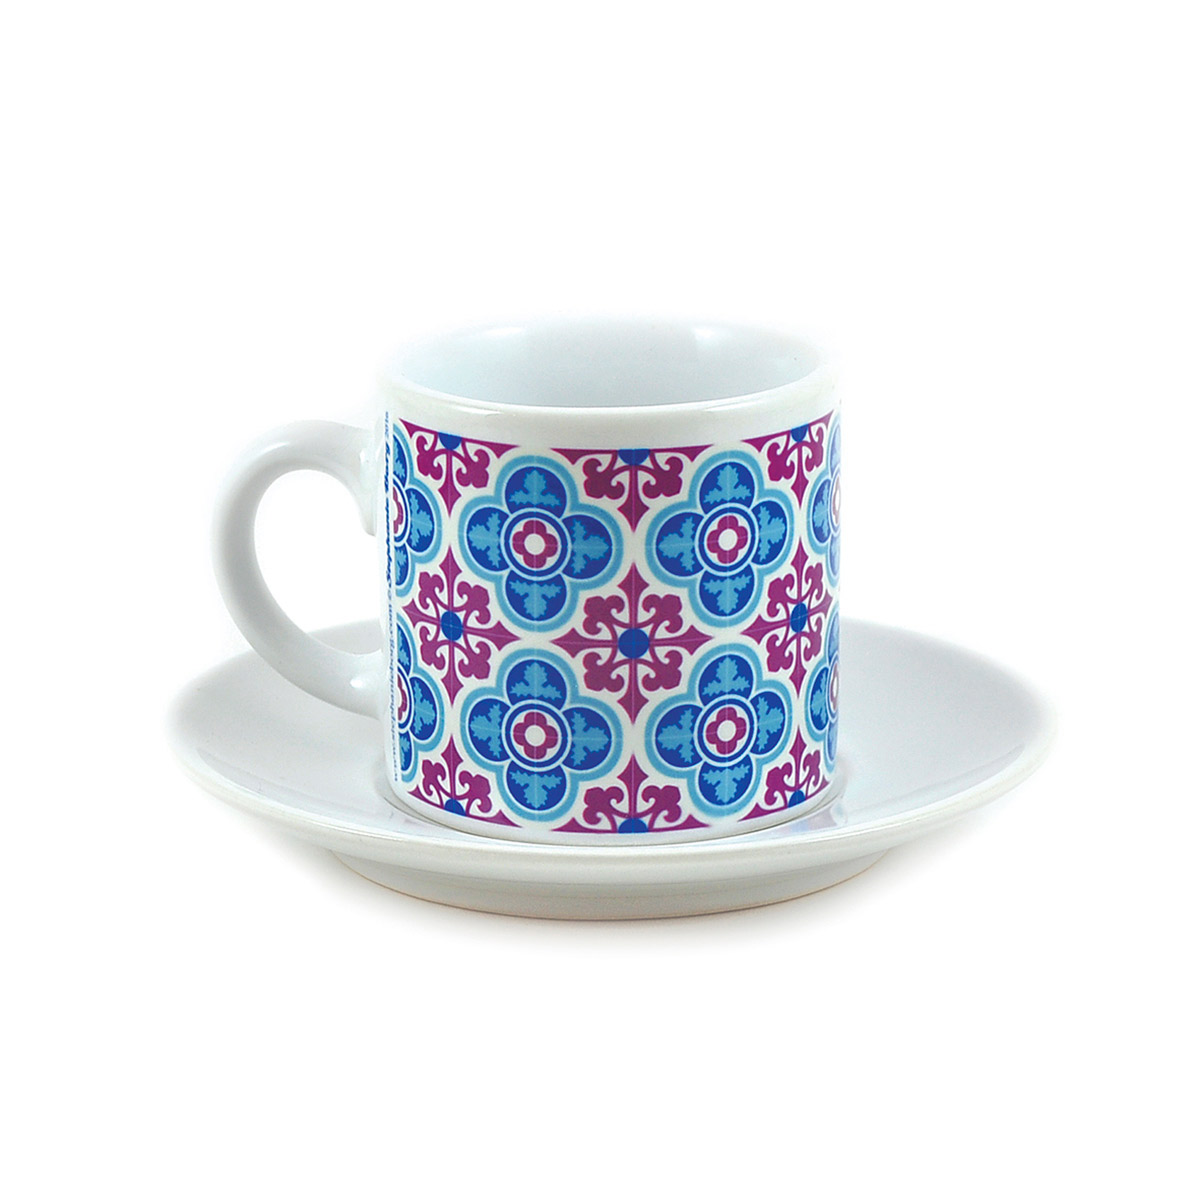 Malta Tile Espresso Cup & Saucer, pattern no.3